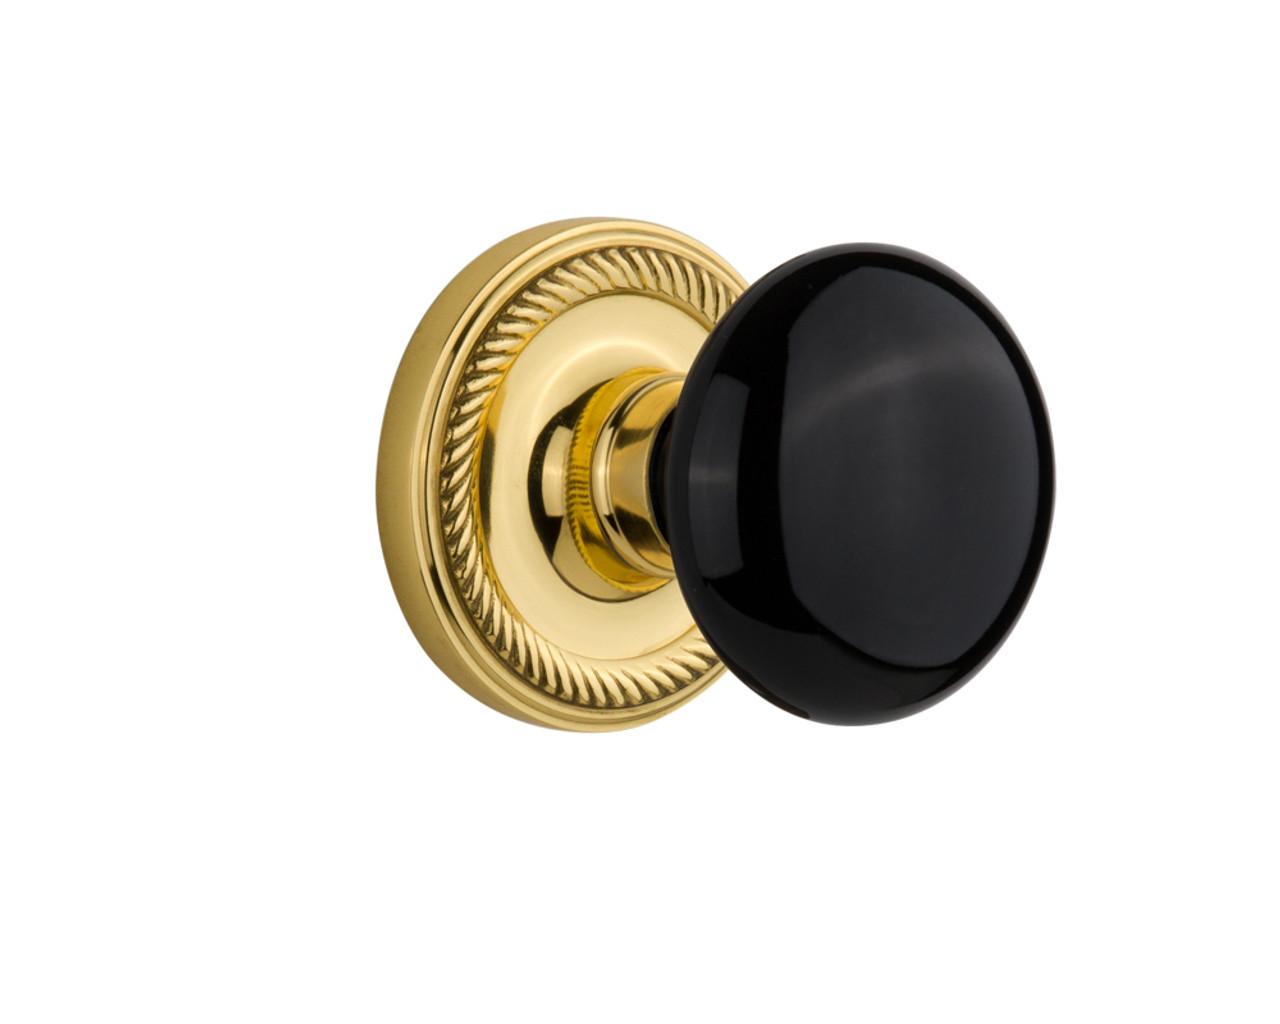 Nostalgic Warehouse Rope Rosette Double Dummy Black Porcelain Door Knob in Polished Brass (NW-710224)